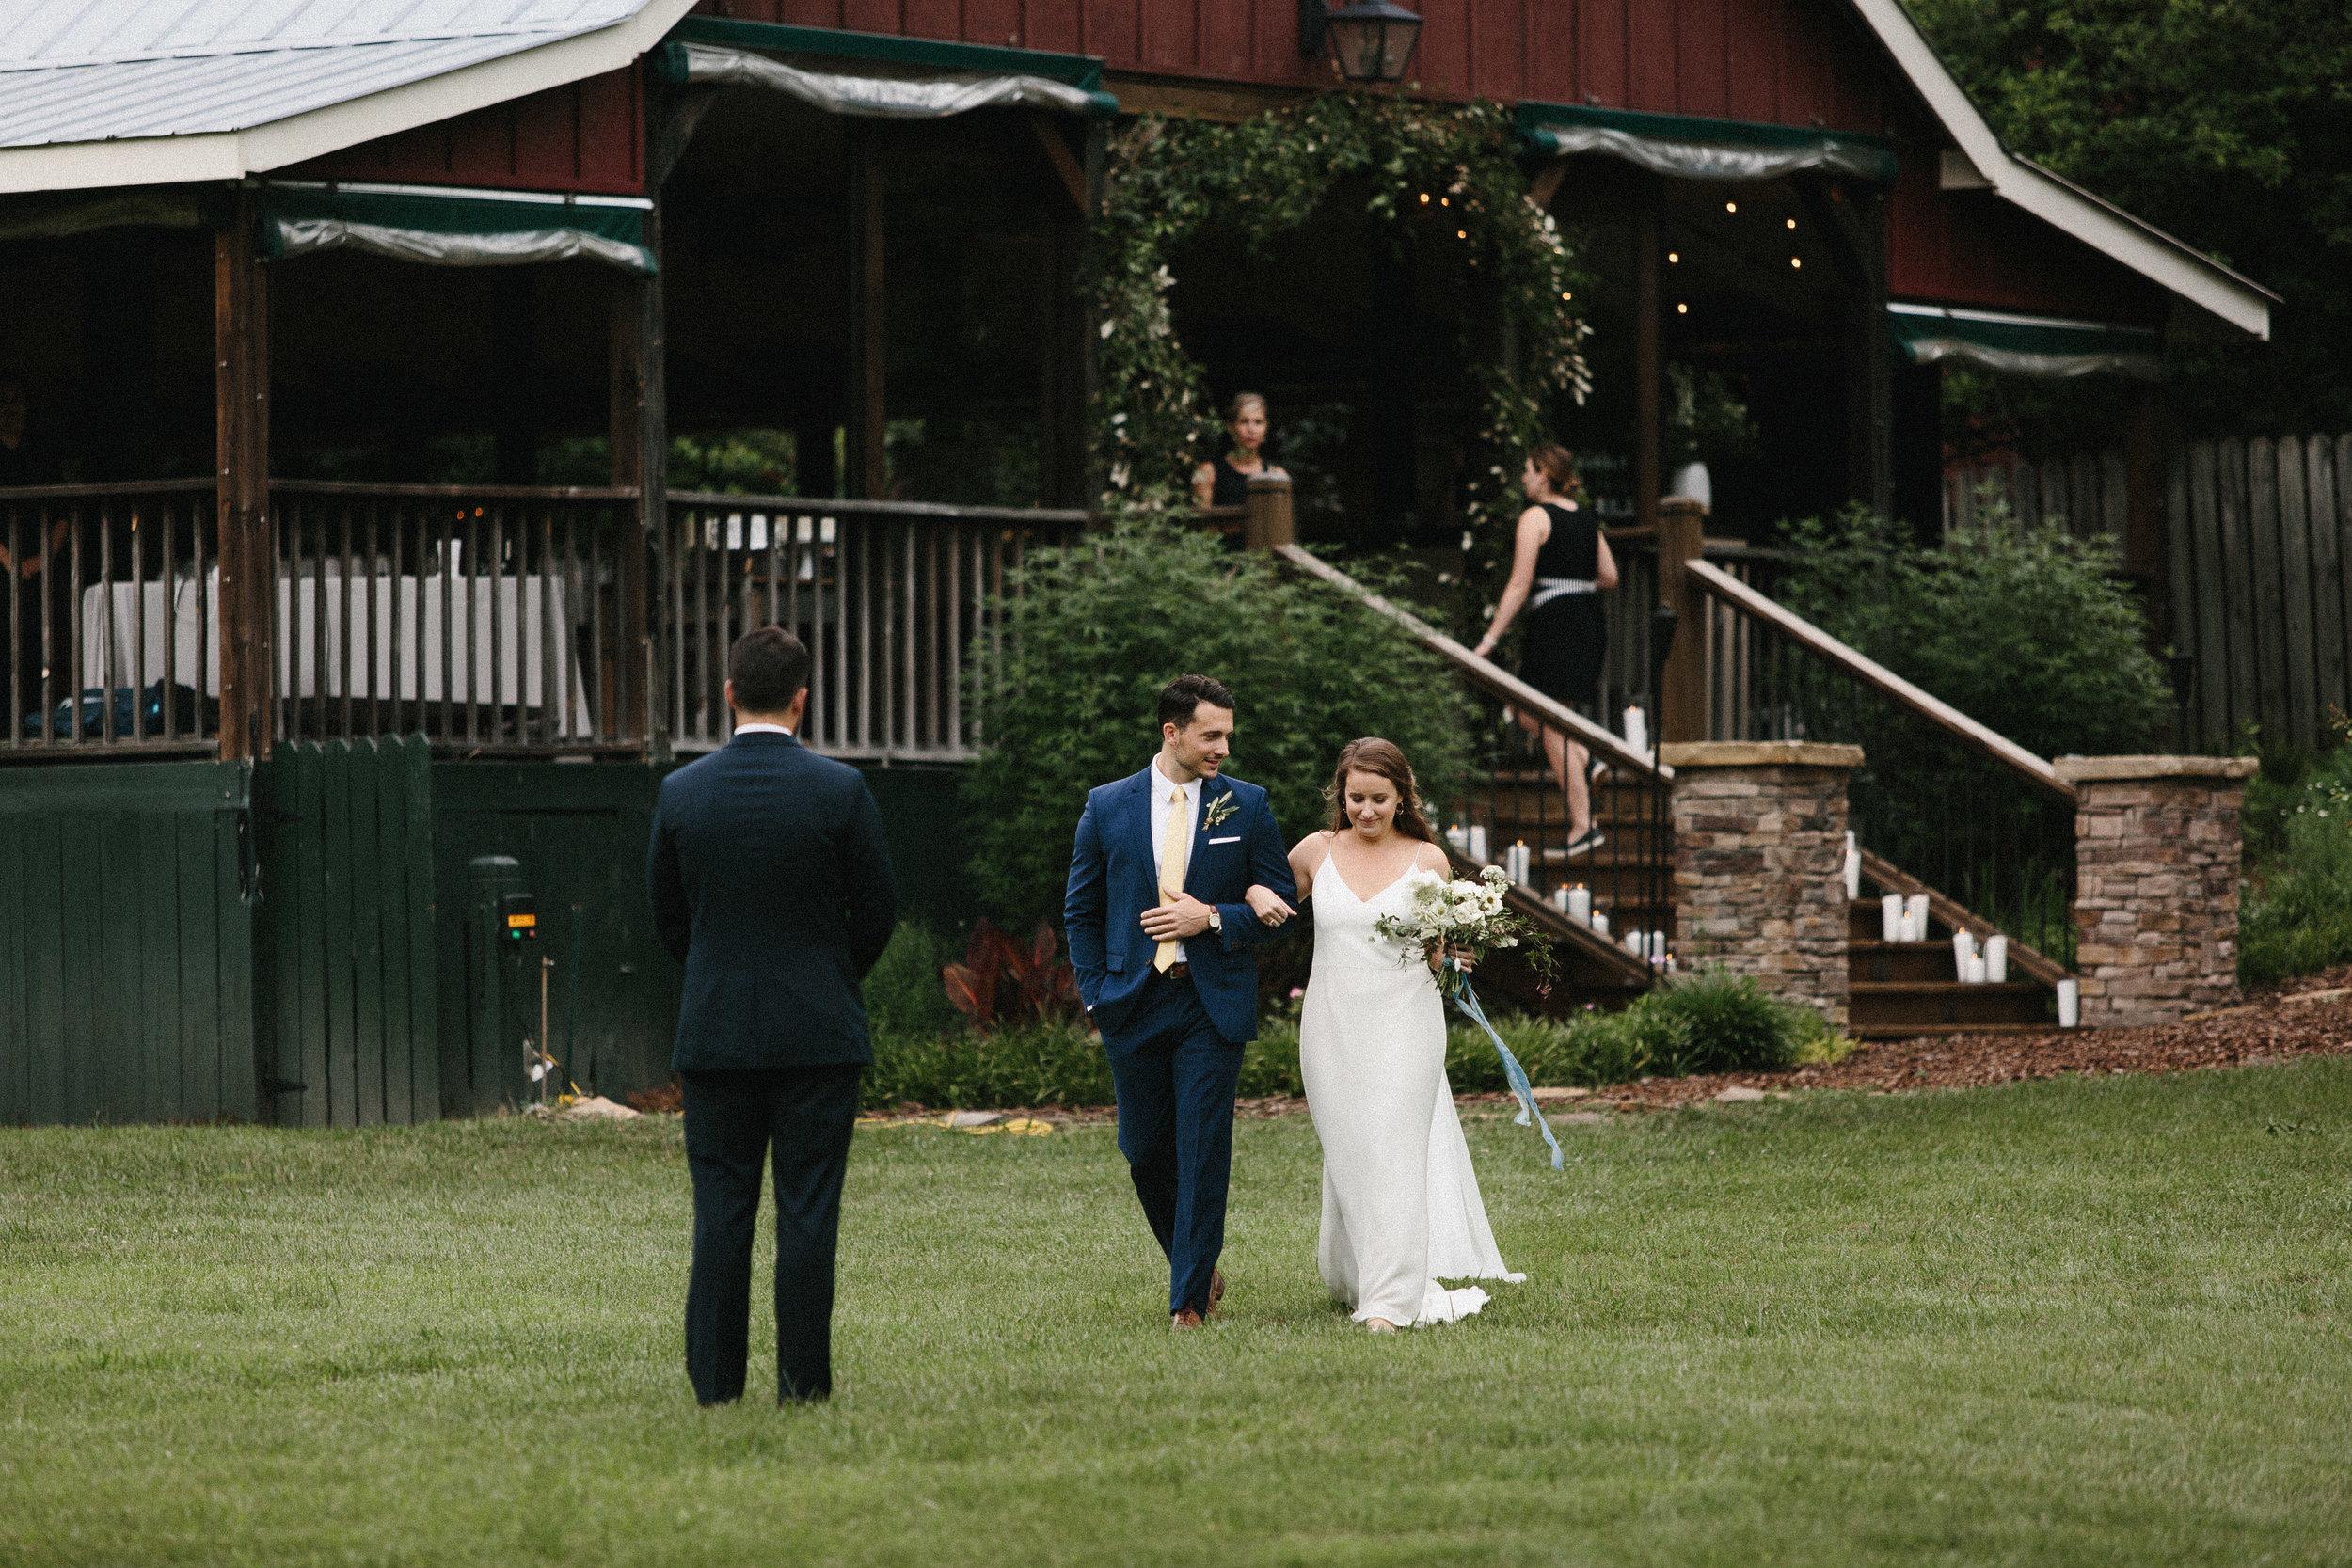 glen_ella_meadow_creekside_atlanta_wedding_photographers_1663.jpg